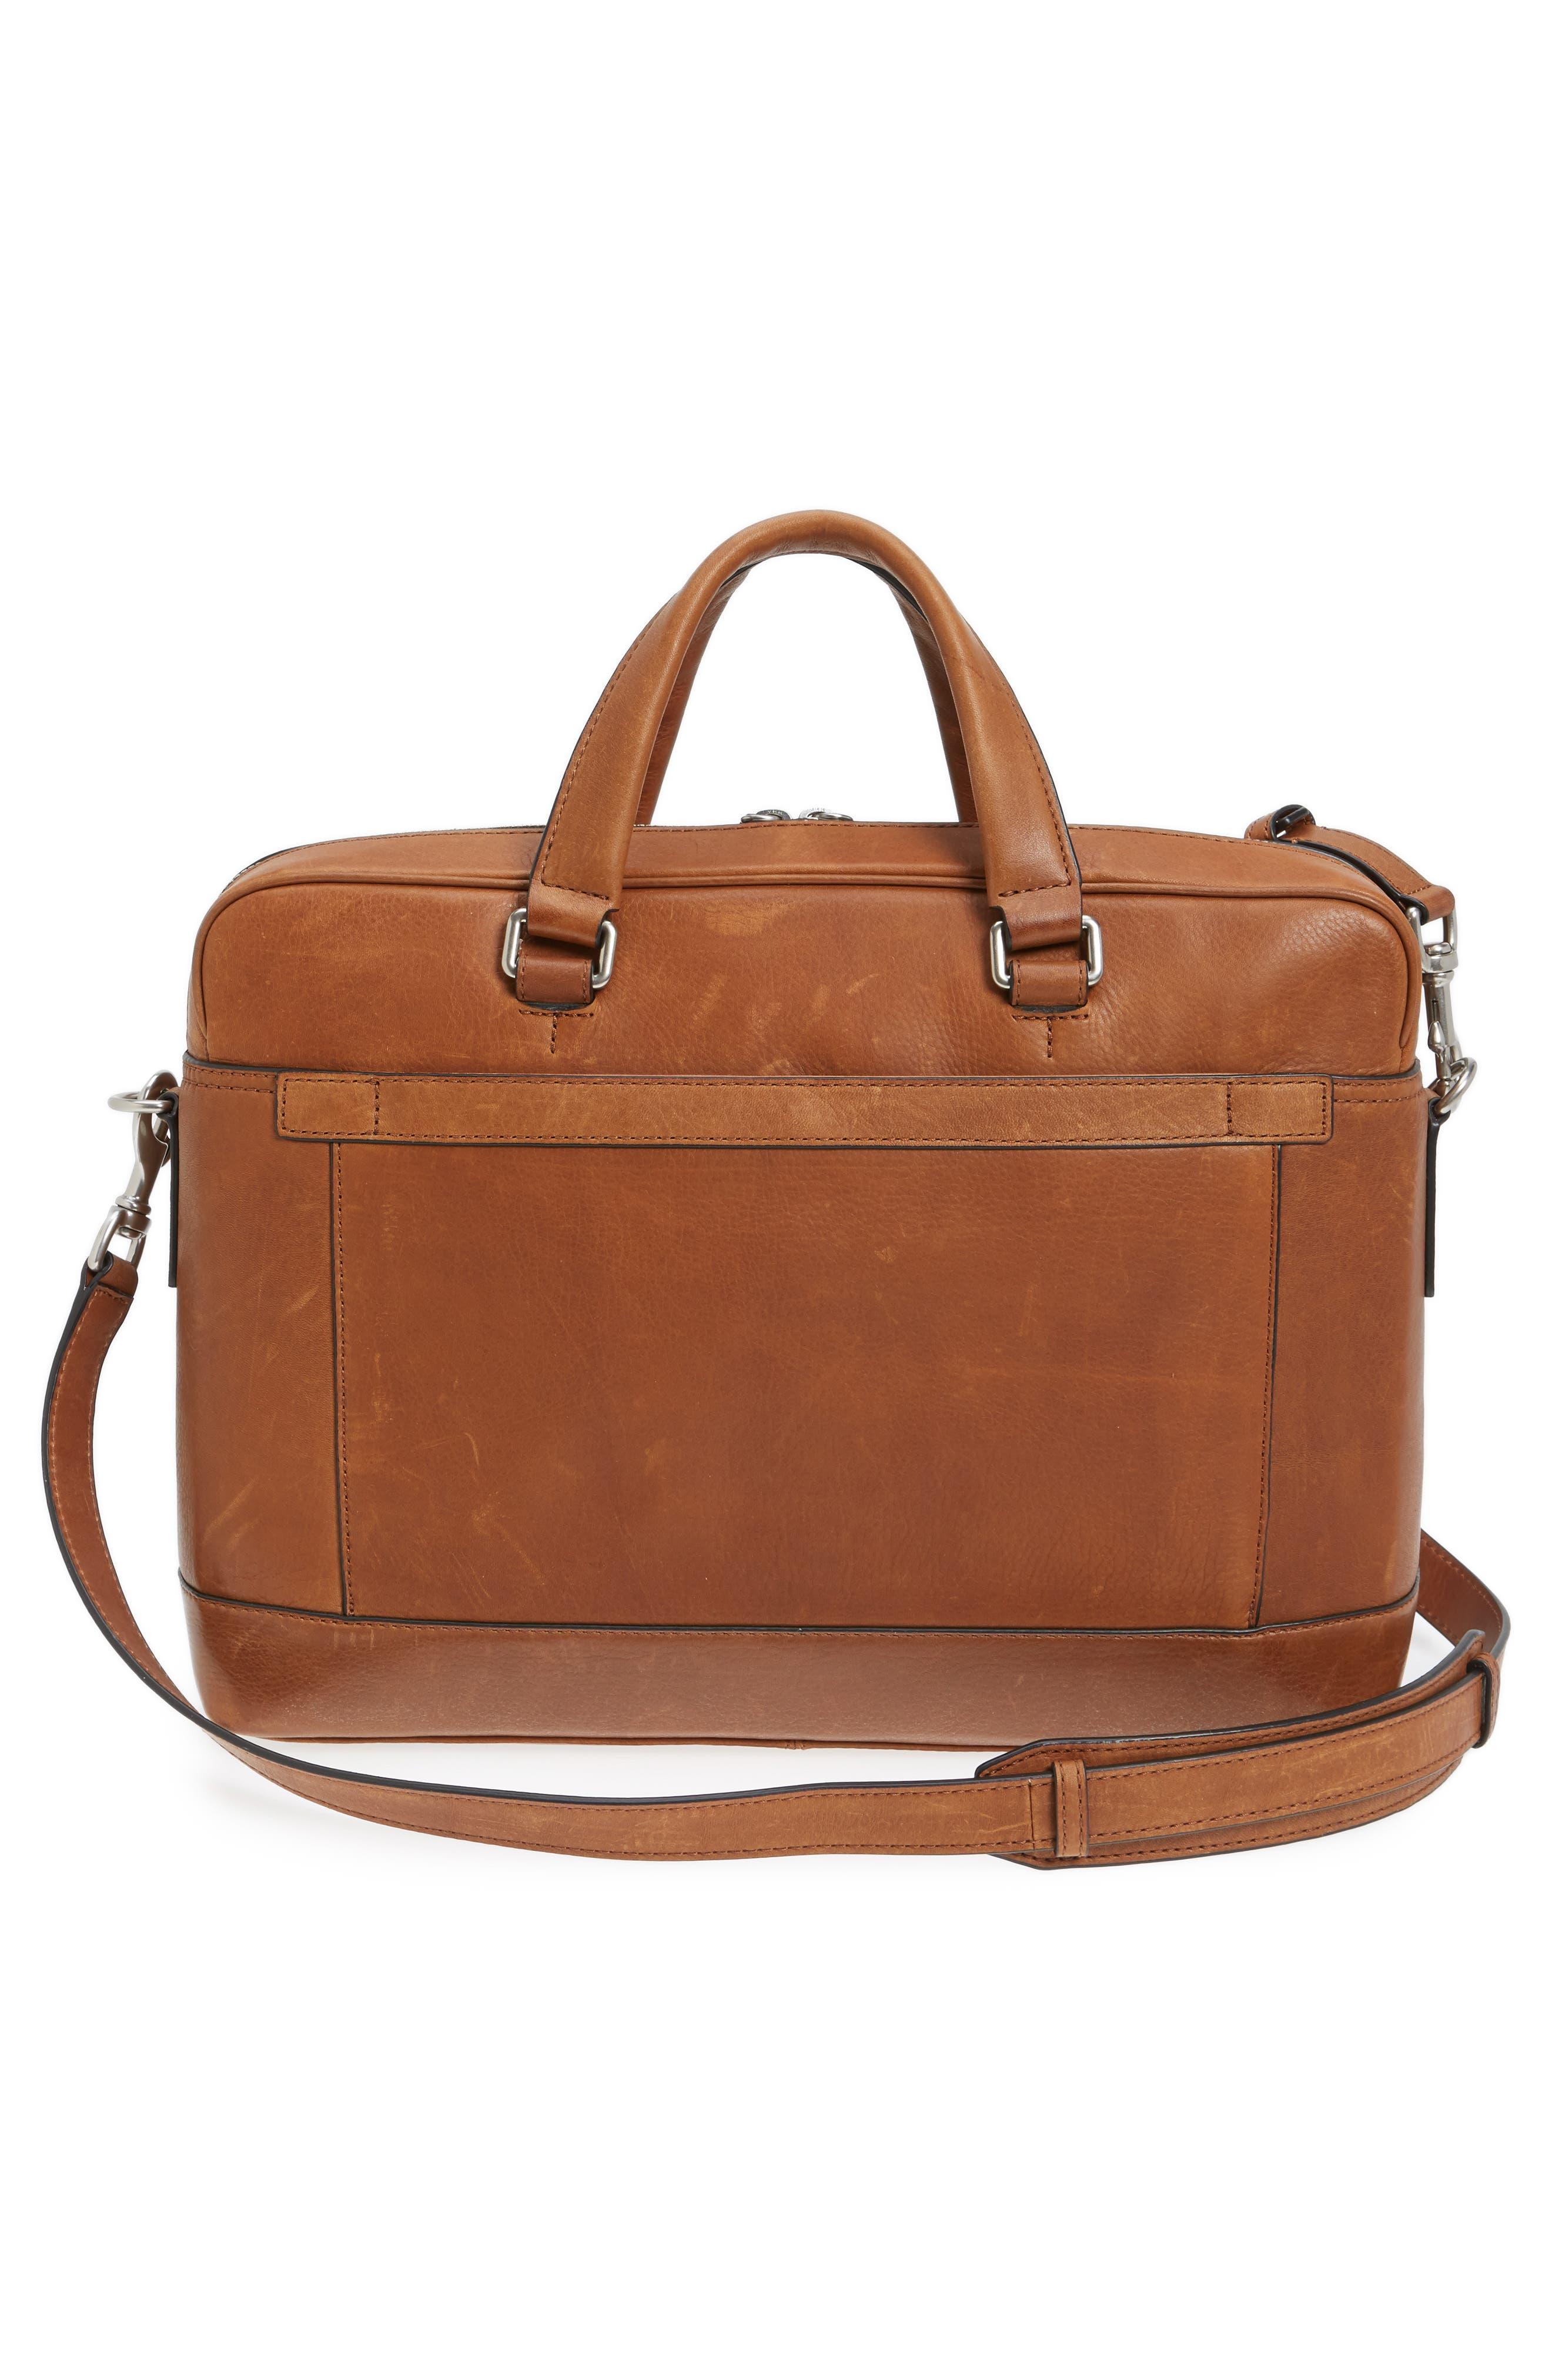 FRYE, Oliver Leather Briefcase, Alternate thumbnail 3, color, 235